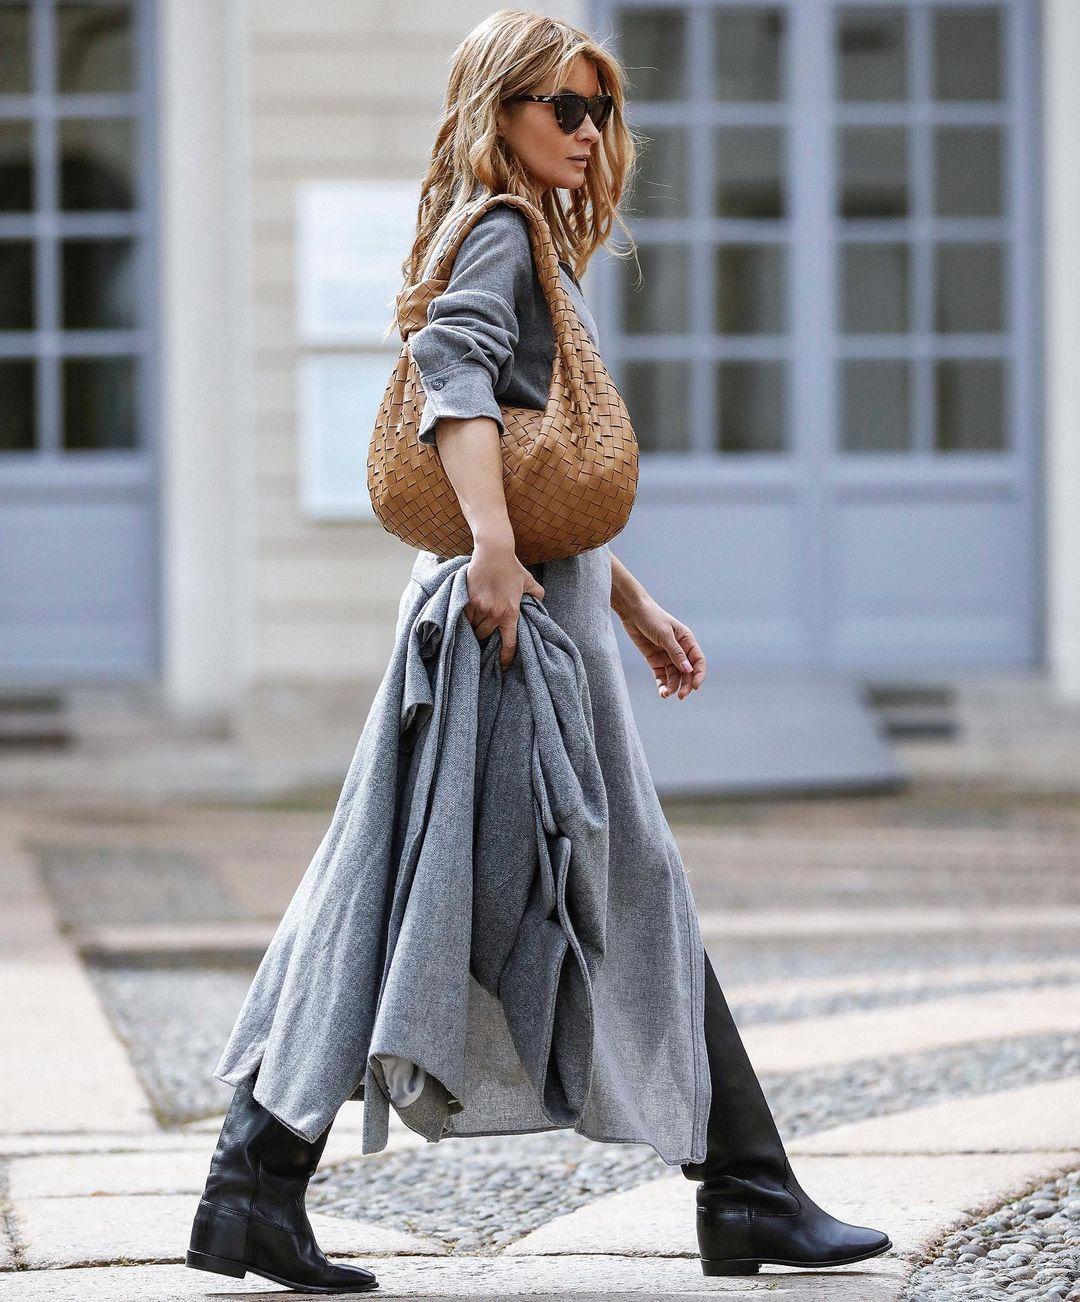 bag botega venetta shoulder bag black boots sweater midi skirt